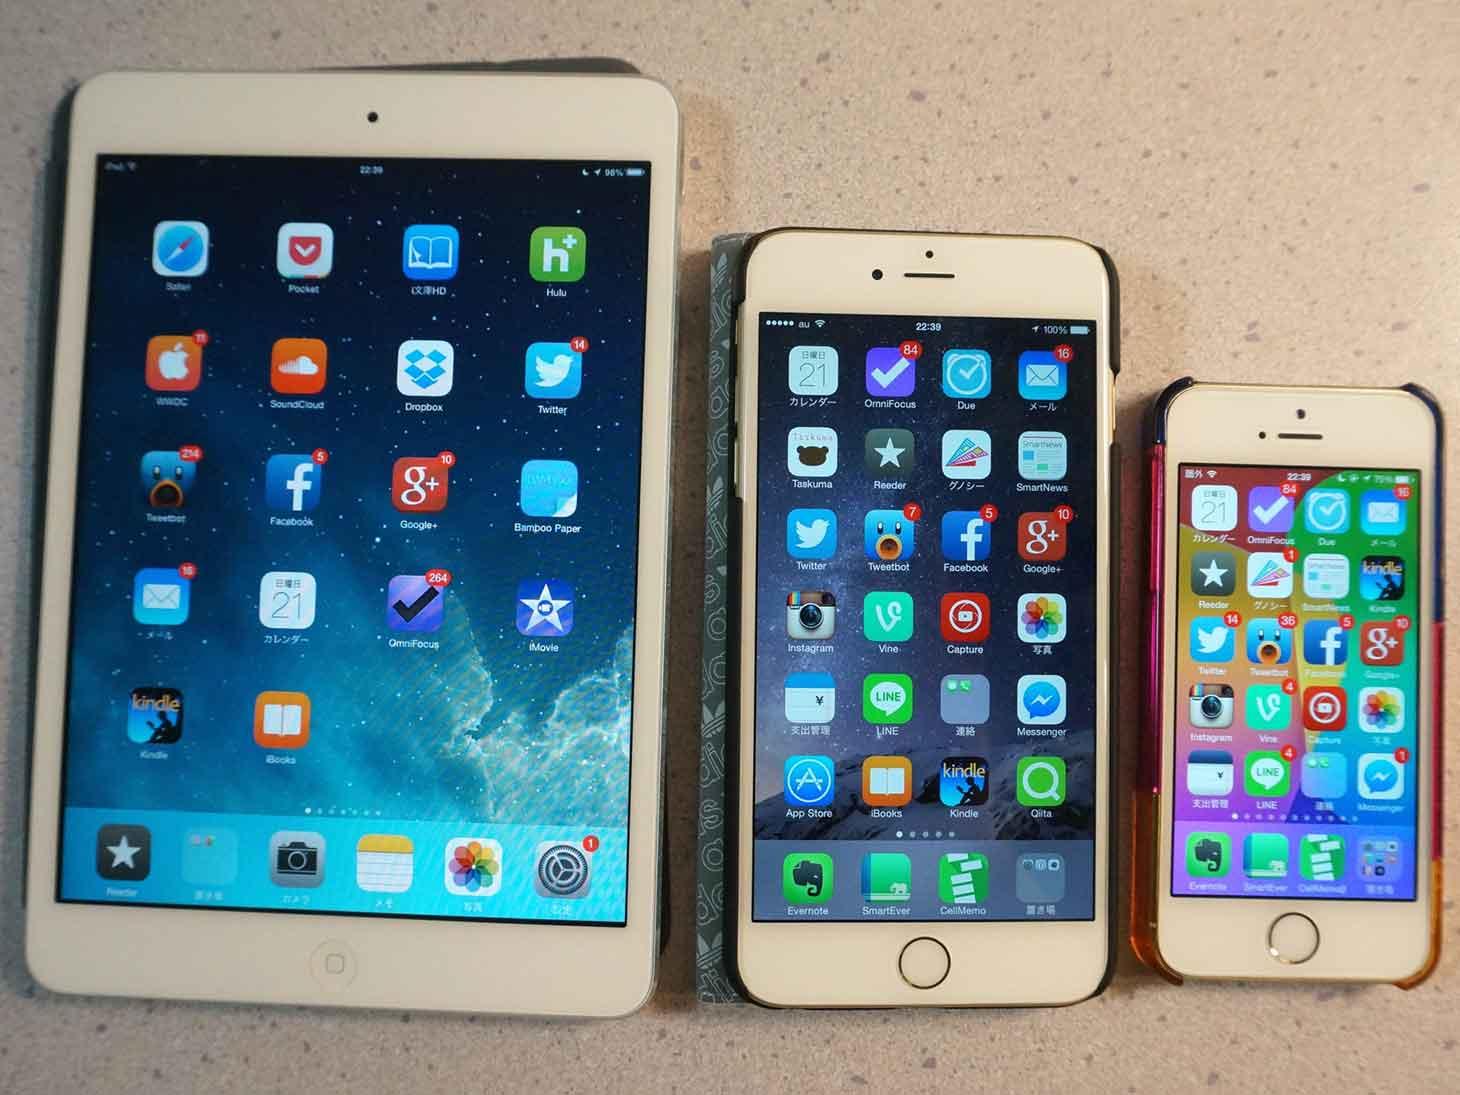 iPhone 6 Plusのホーム1画面目に置いているオススメなアプリ35本(2014年11月版)